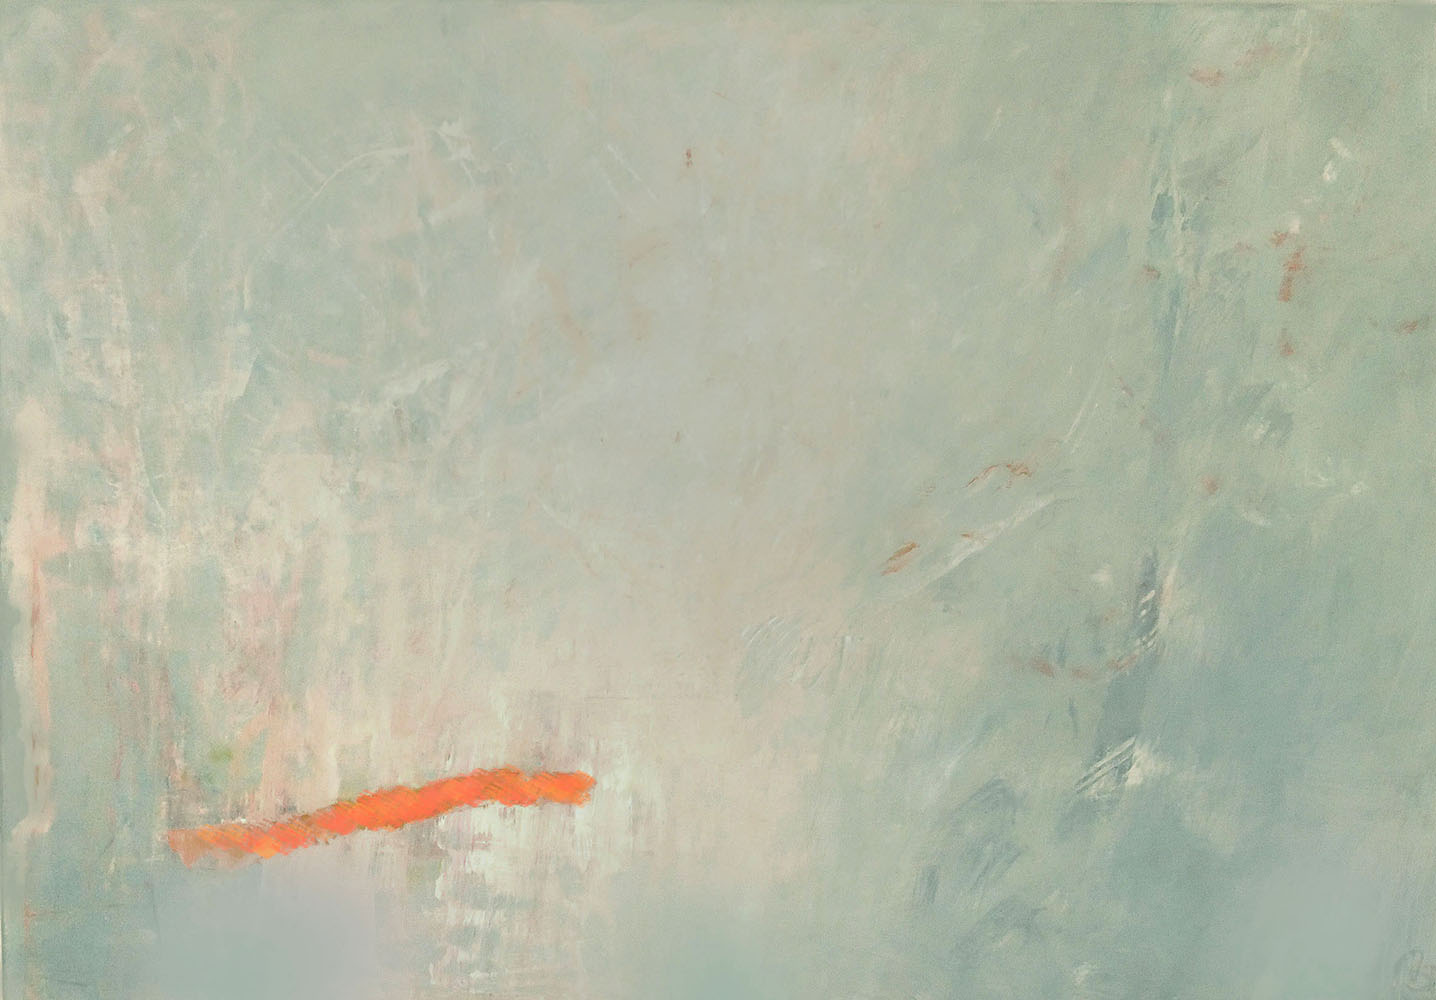 Bewegtes Feld mit Orange130x90 cm